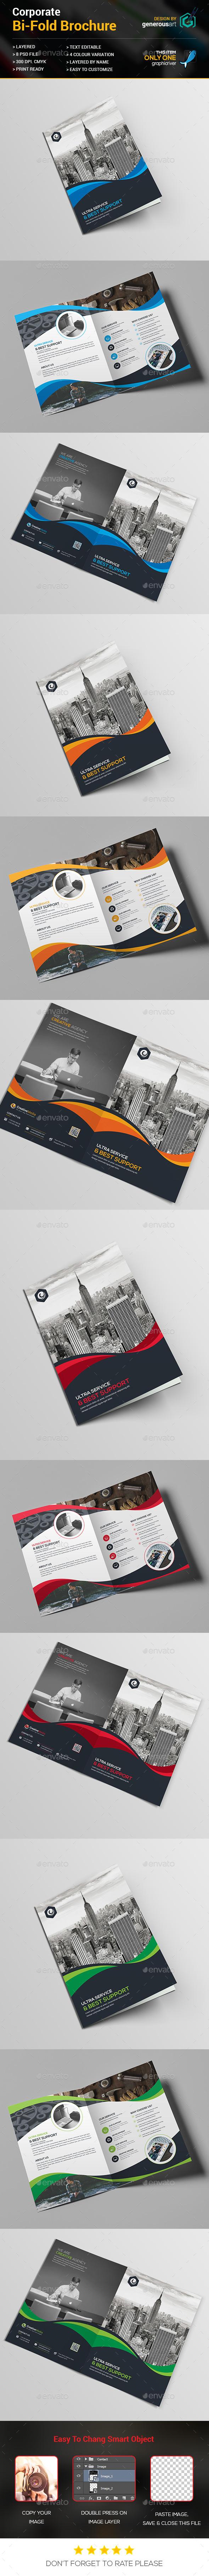 A4 Bi-Fold Brochure Template - Brochures Print Templates